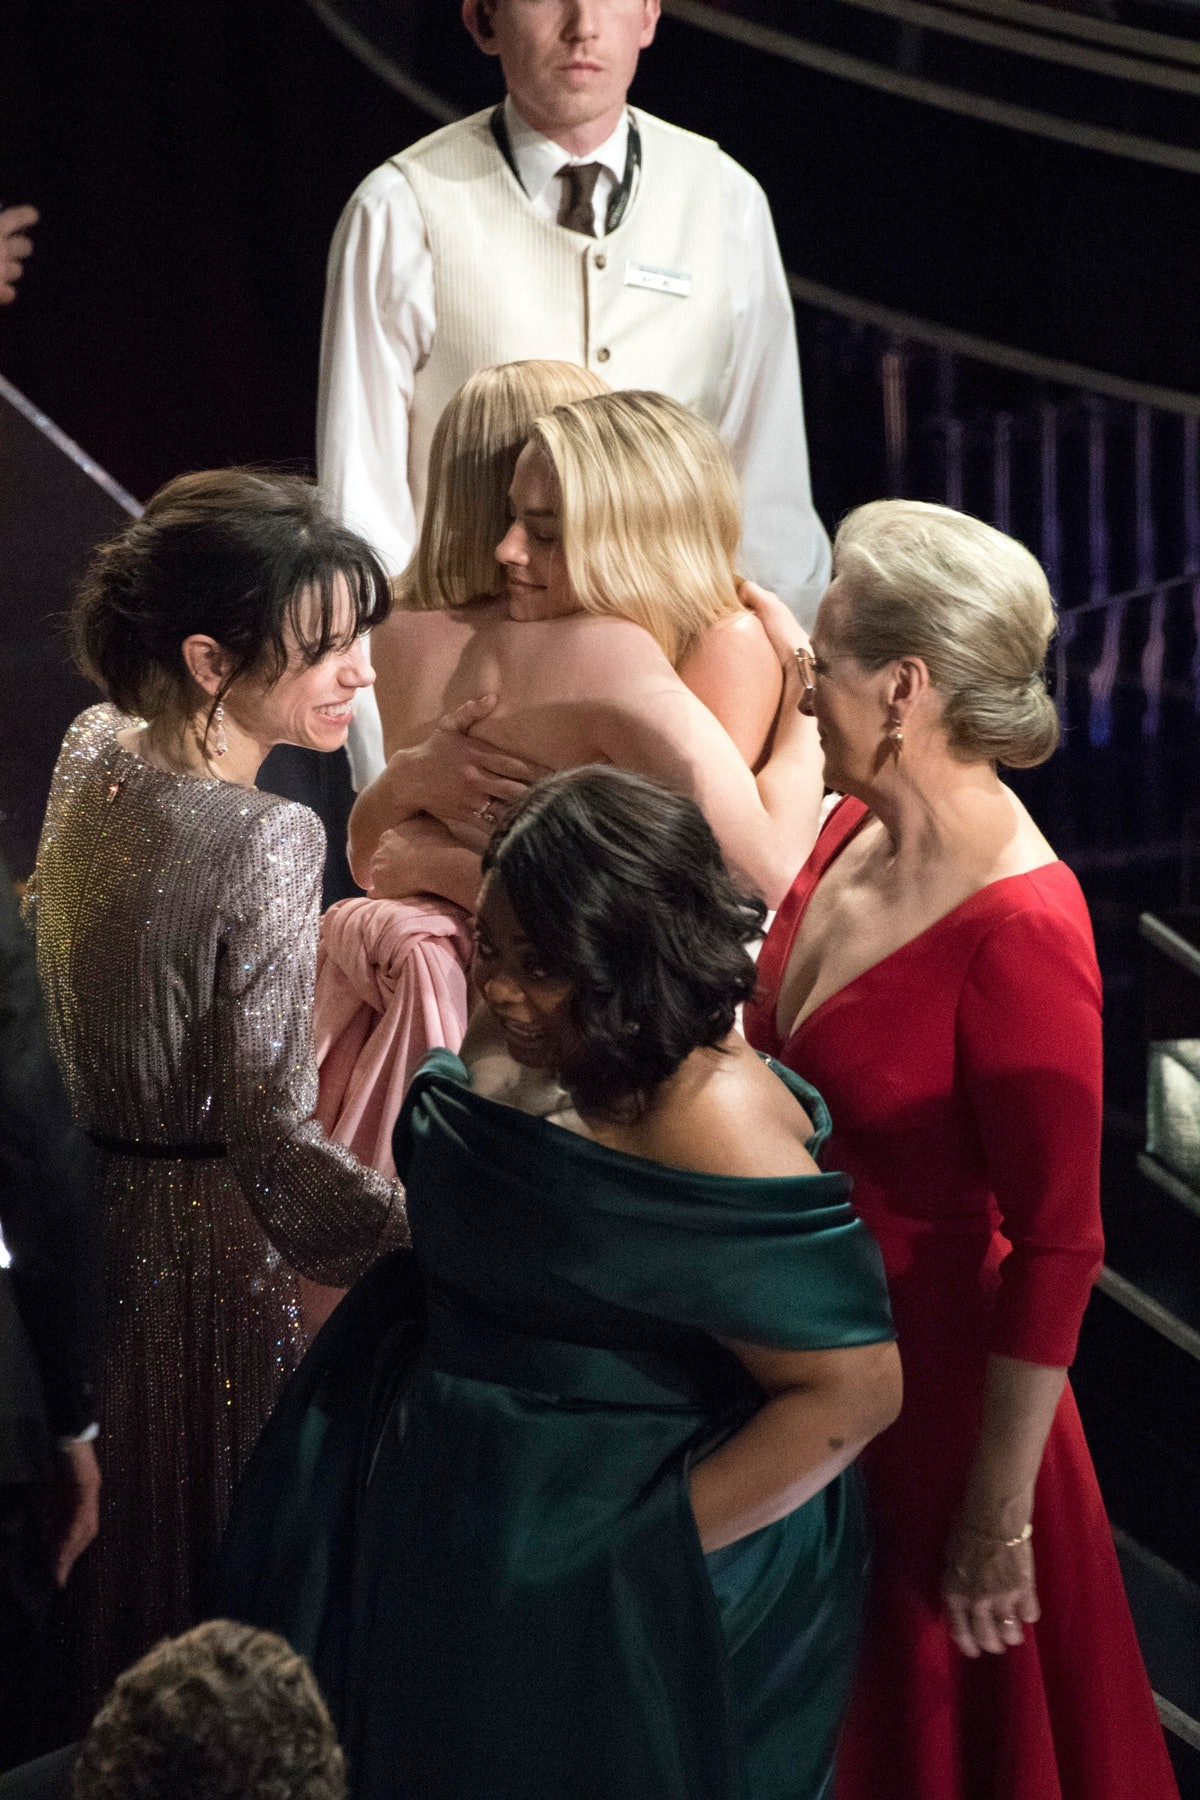 best-actress-losers-hug-oscars-2018-02-NEW.jpg